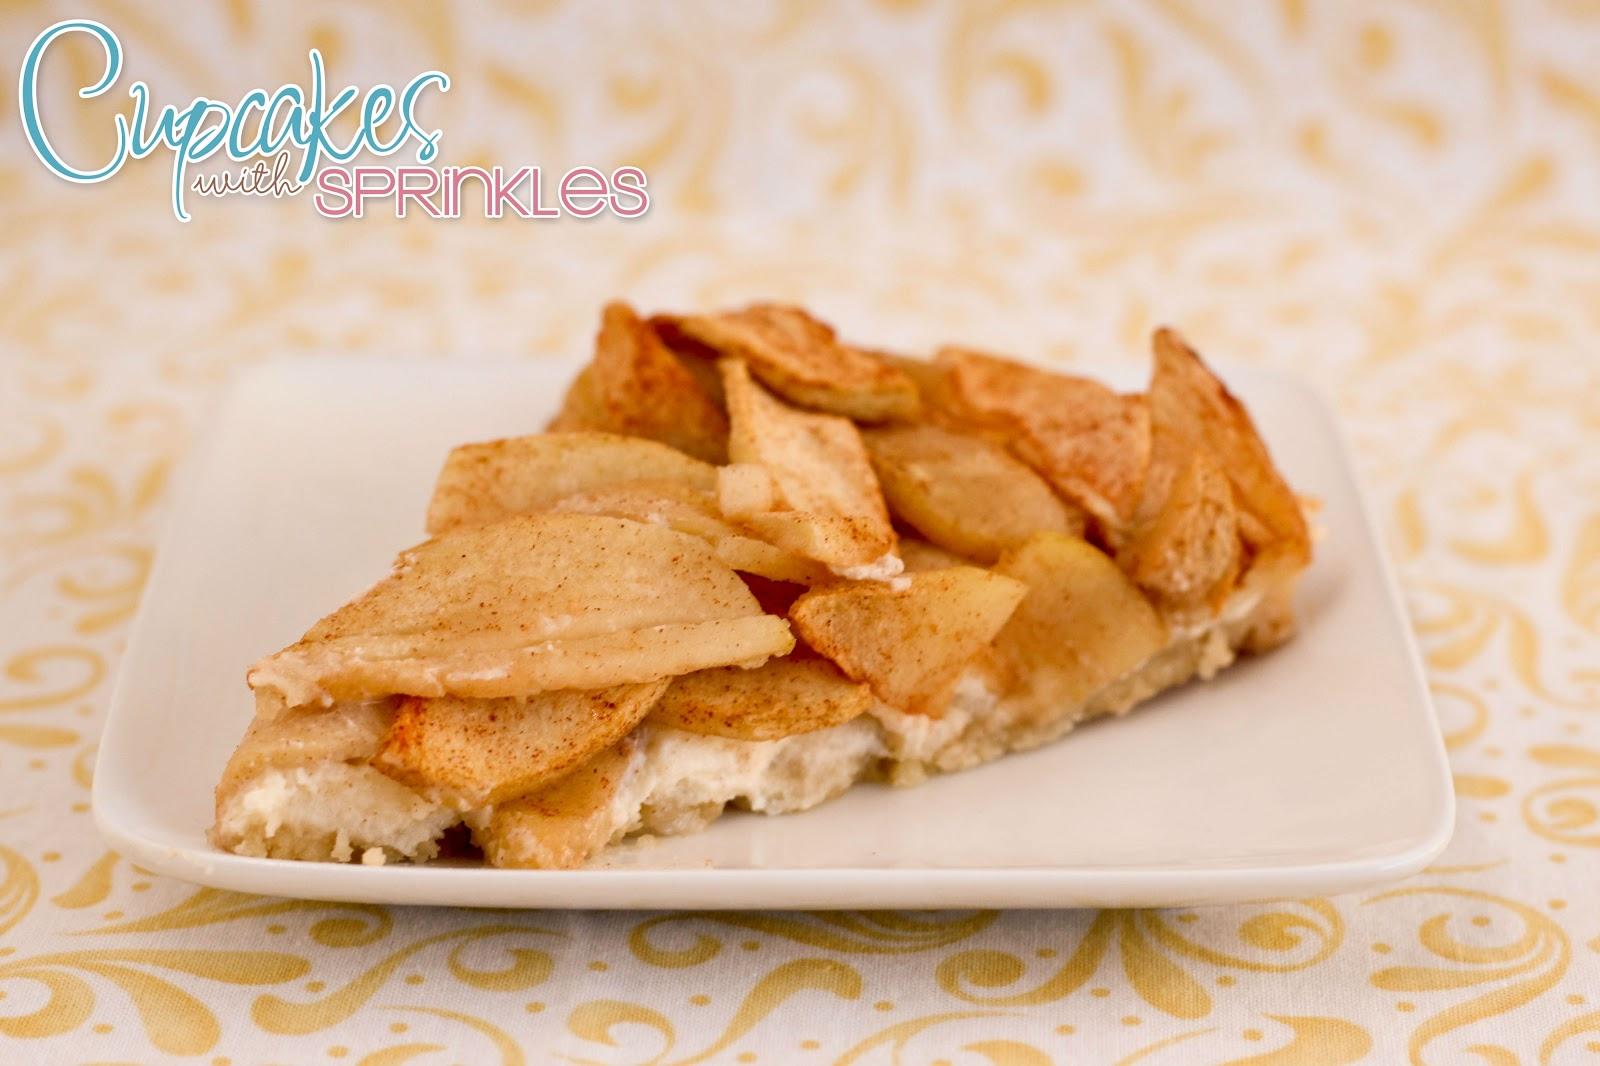 Cupcakes with Sprinkles: Barvarian Apple Torte